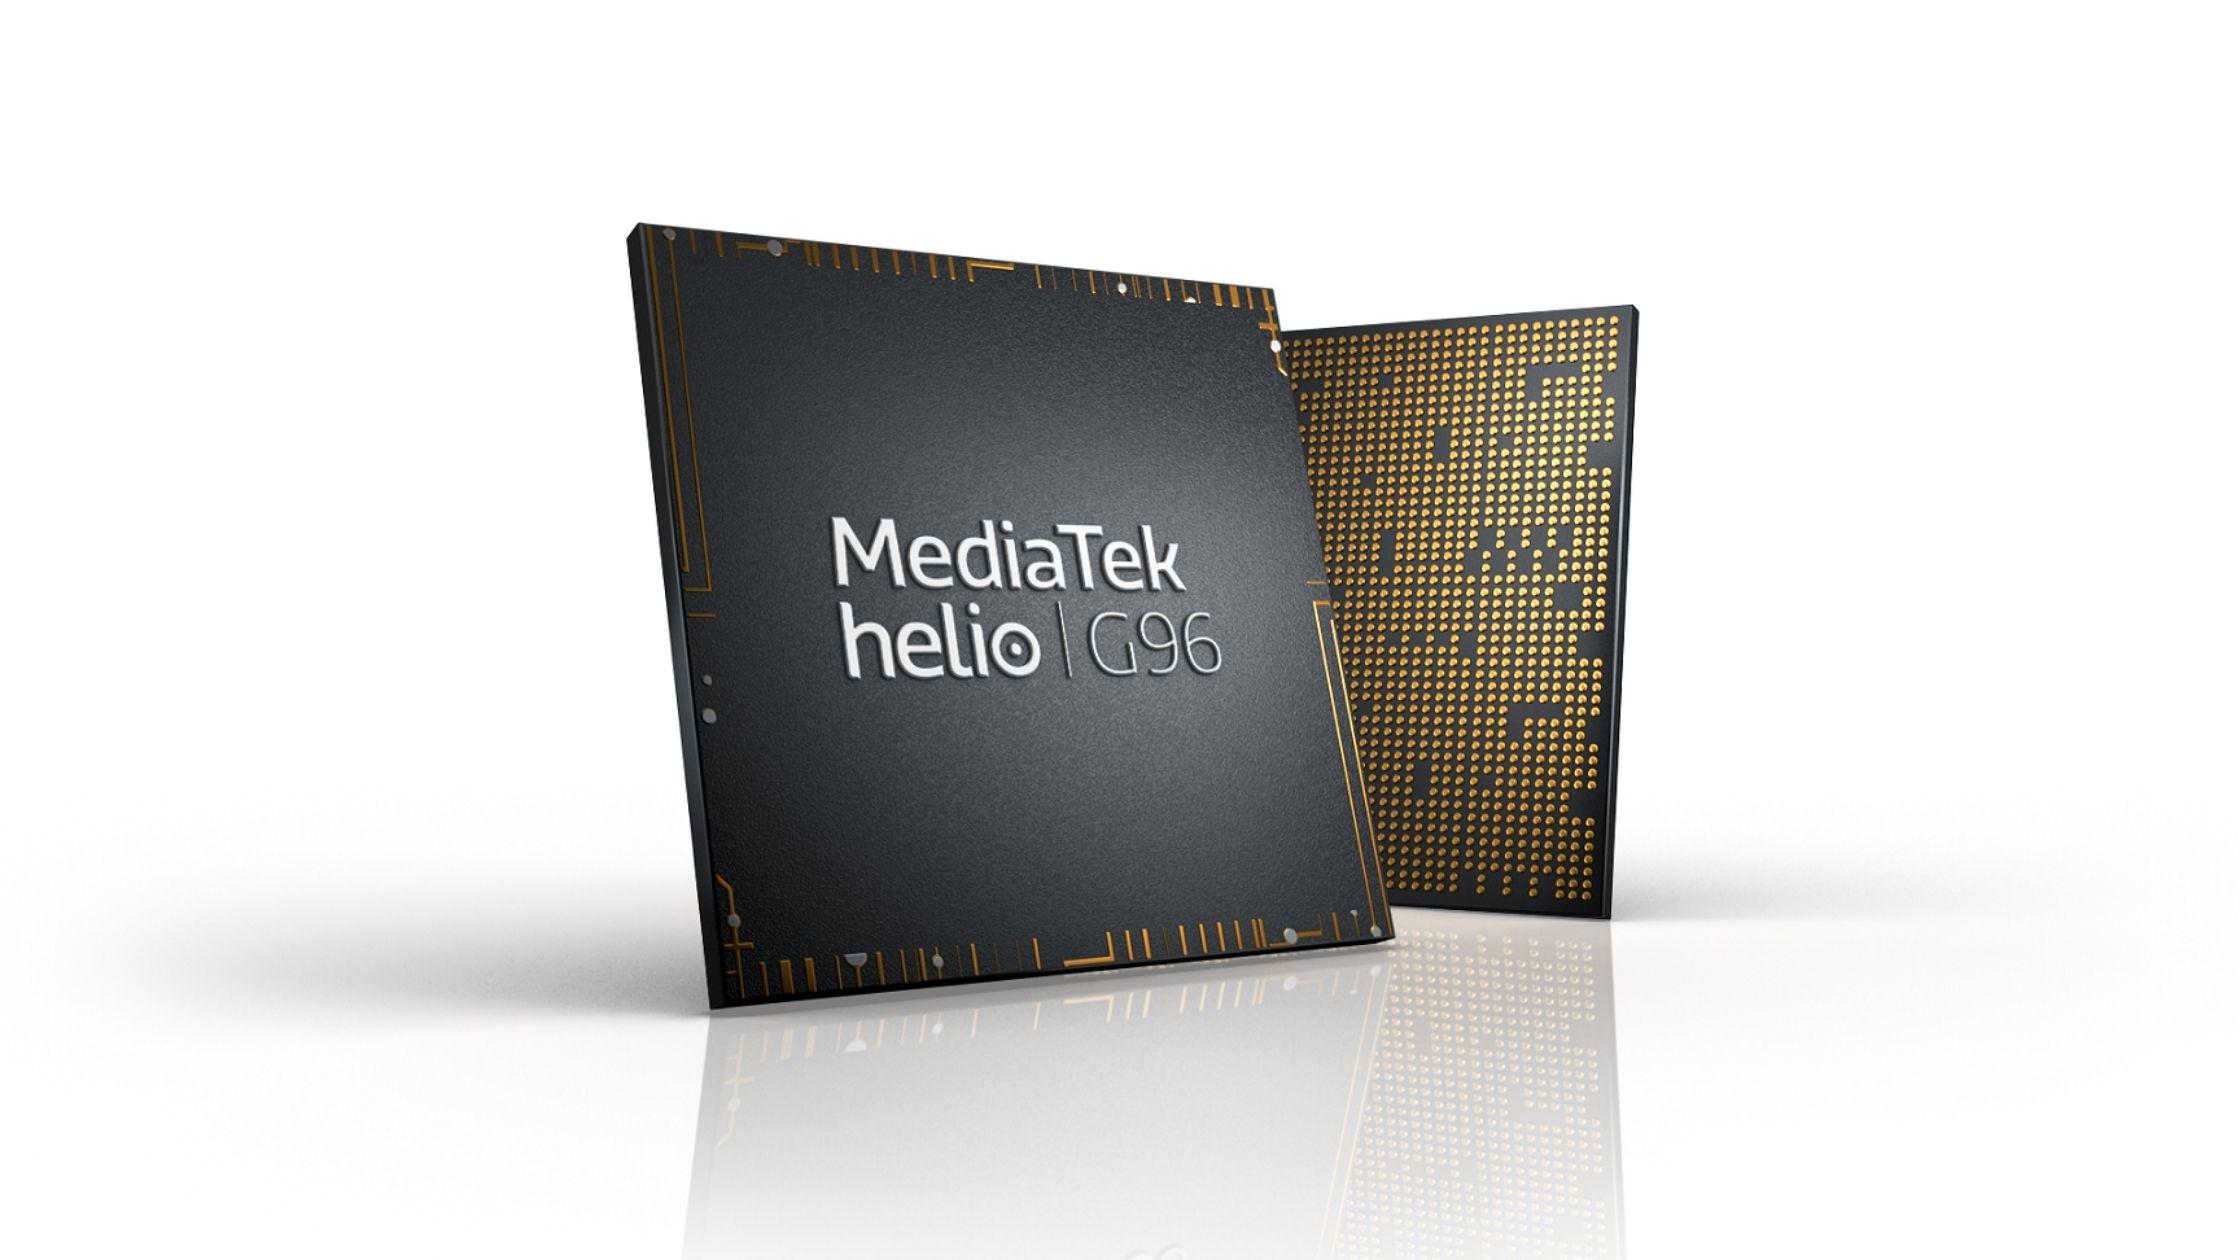 MediaTek Helio G96 and Helio G88